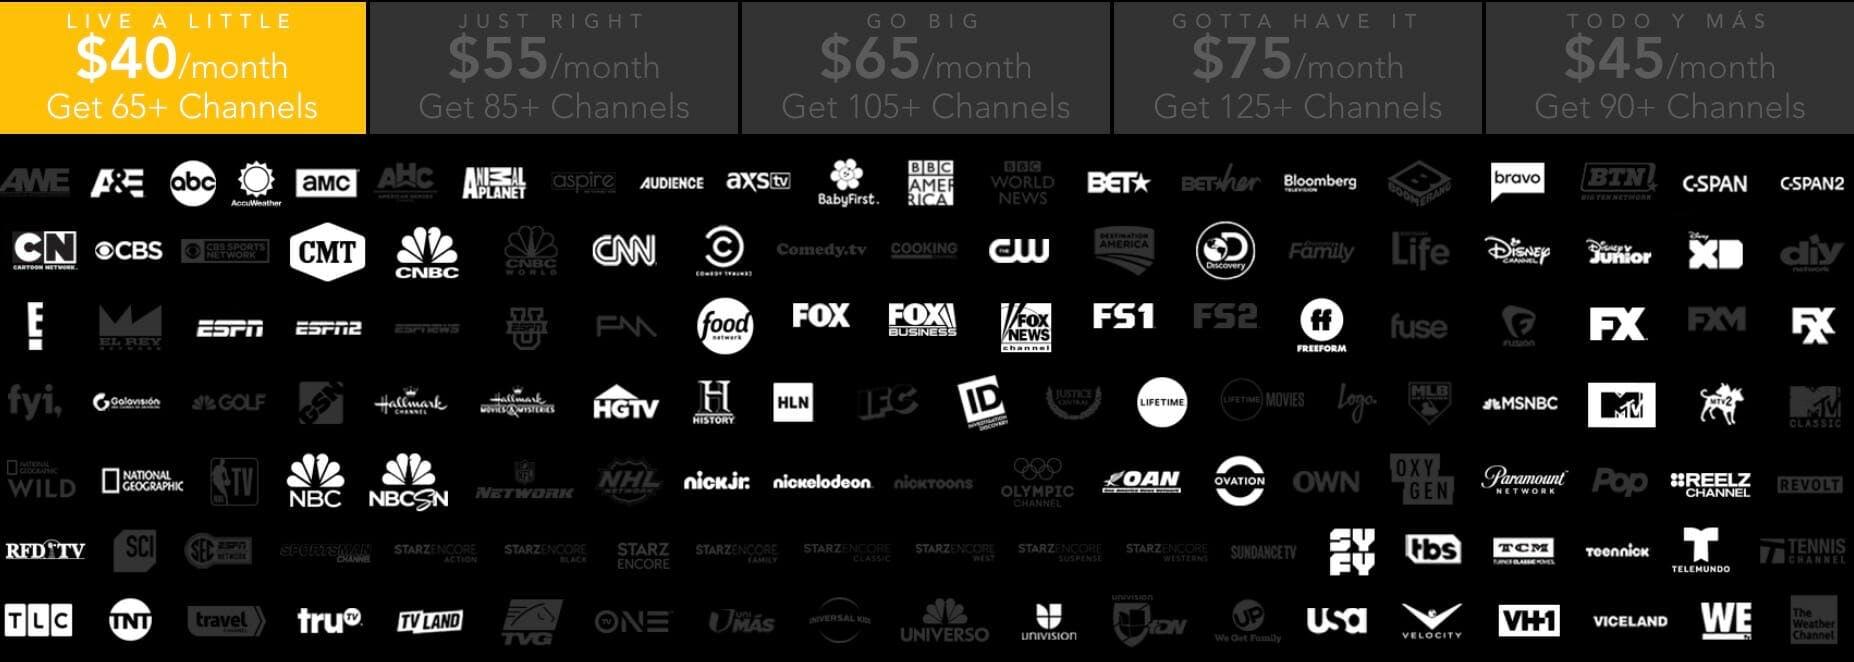 DirecTV Now channels list - live a little